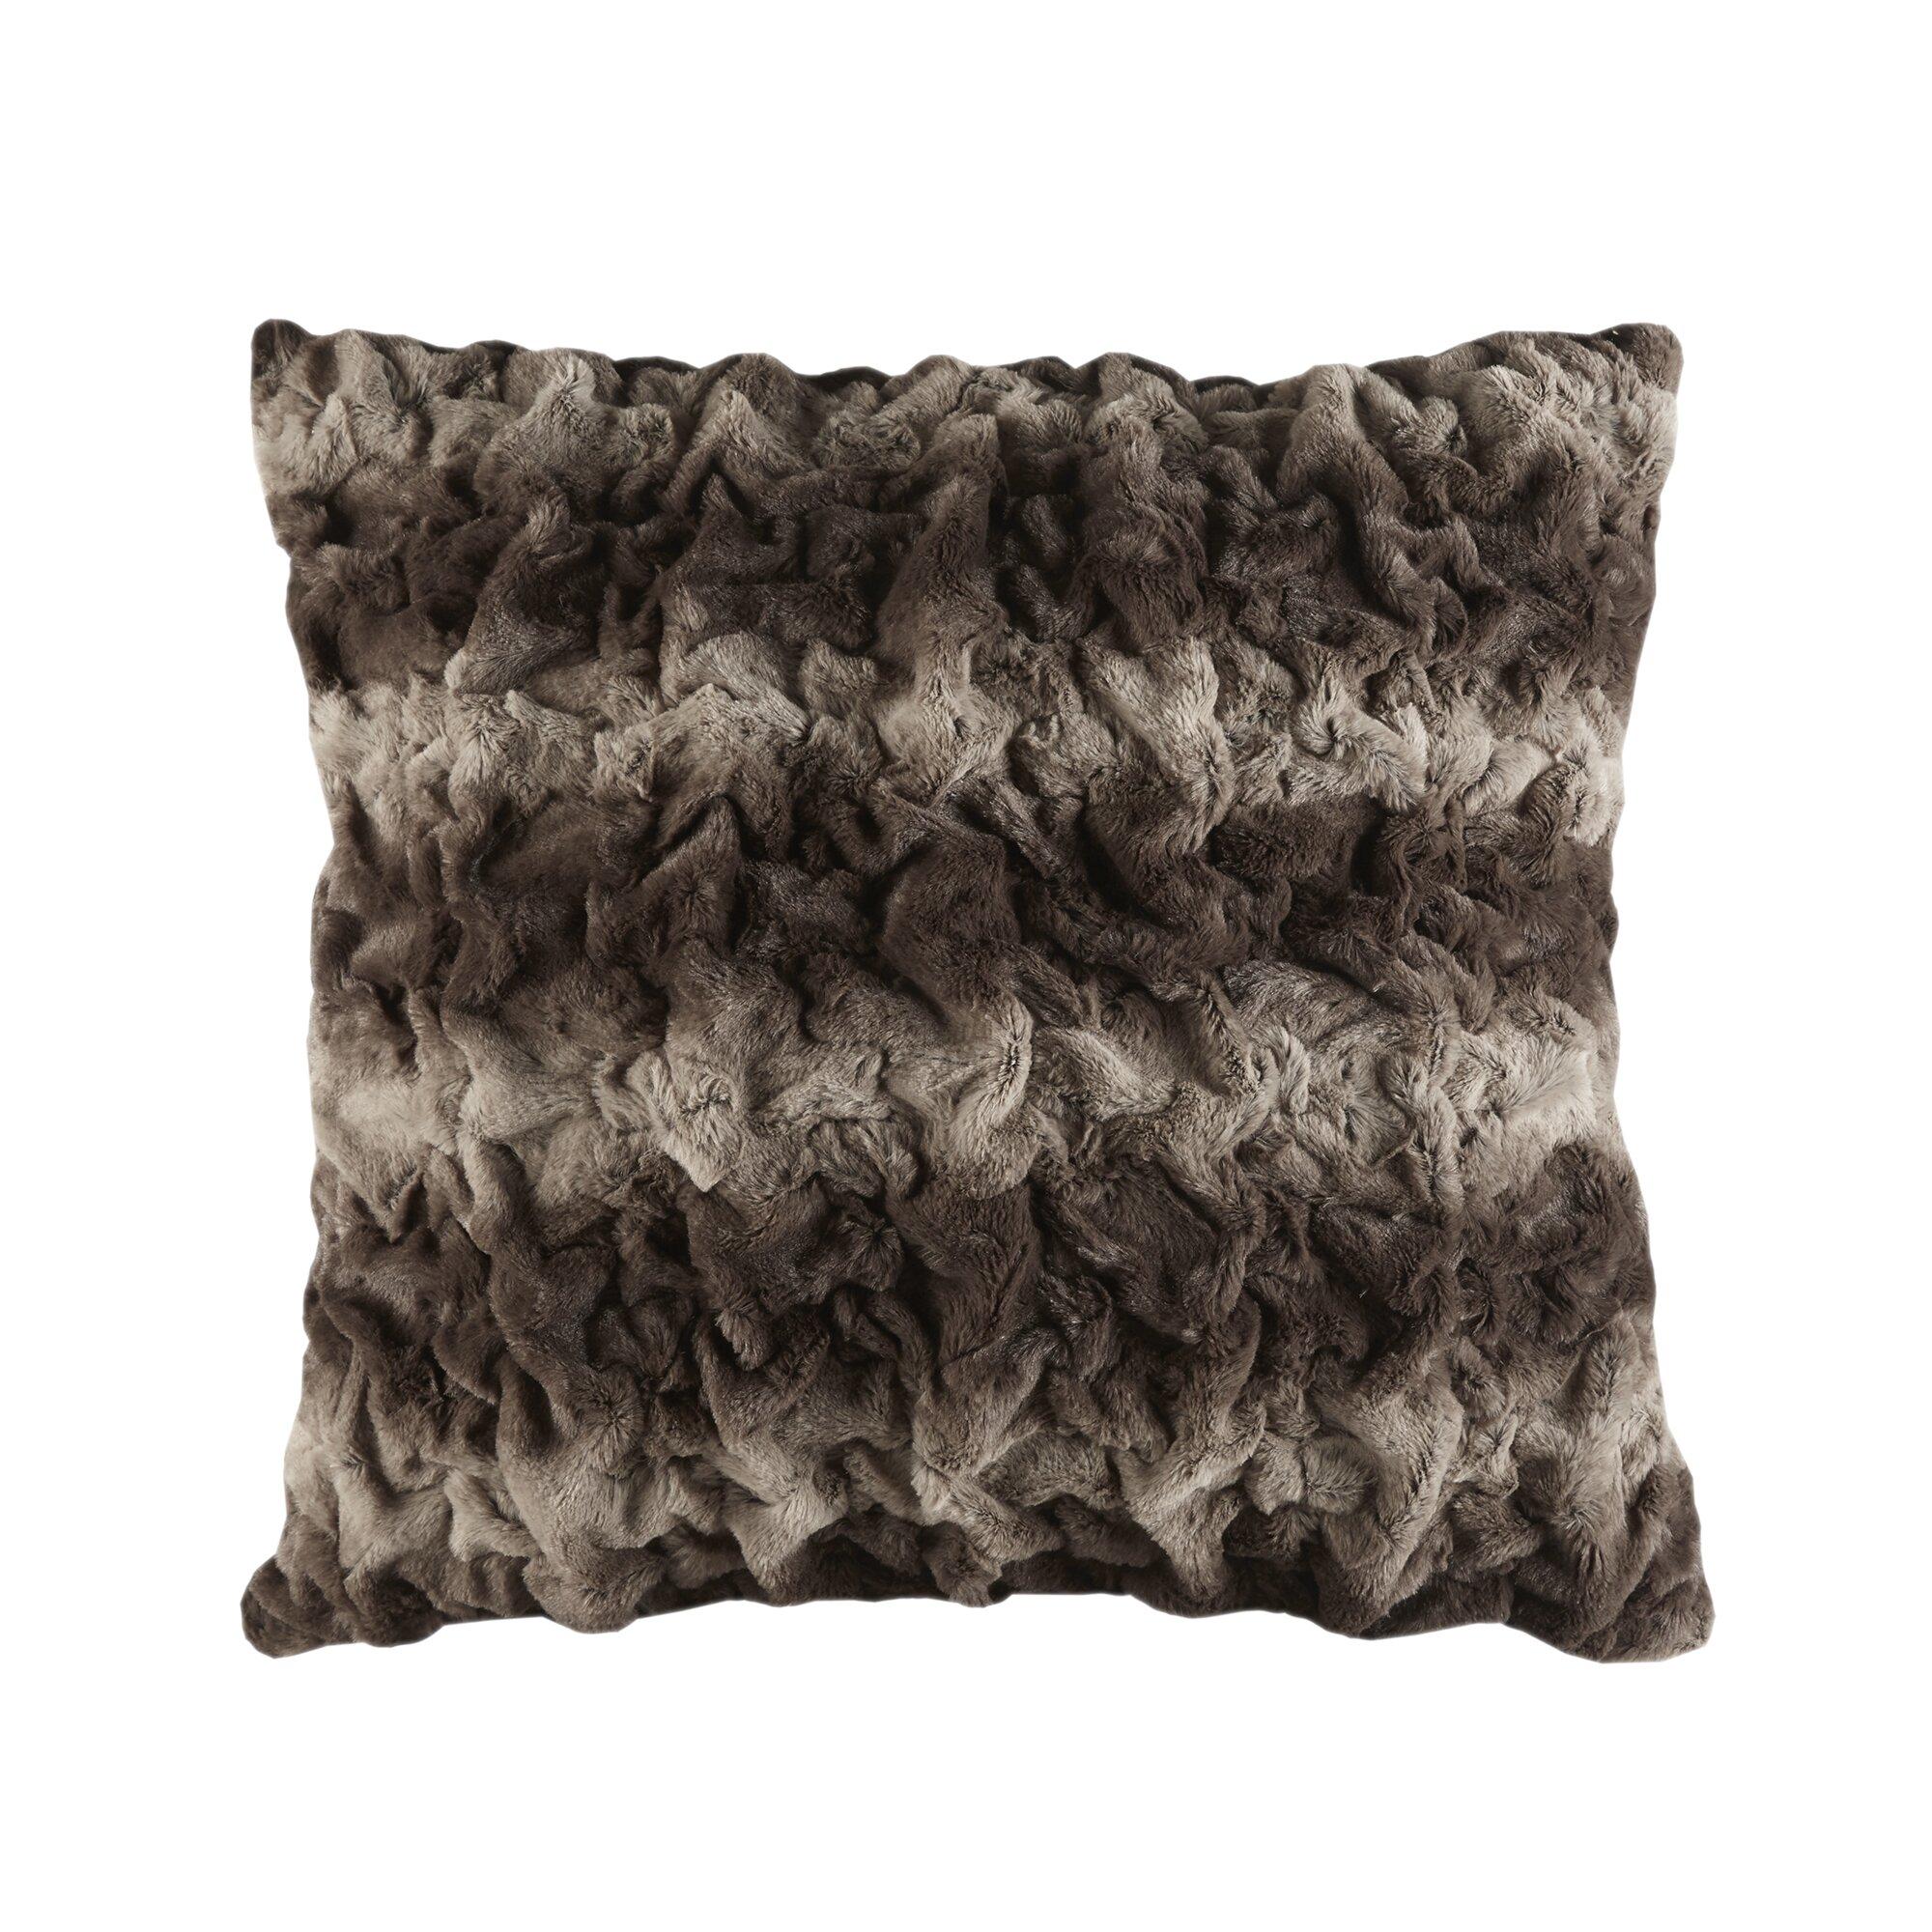 House of hampton fellner euro pillow wayfair for Buy hampton inn pillows